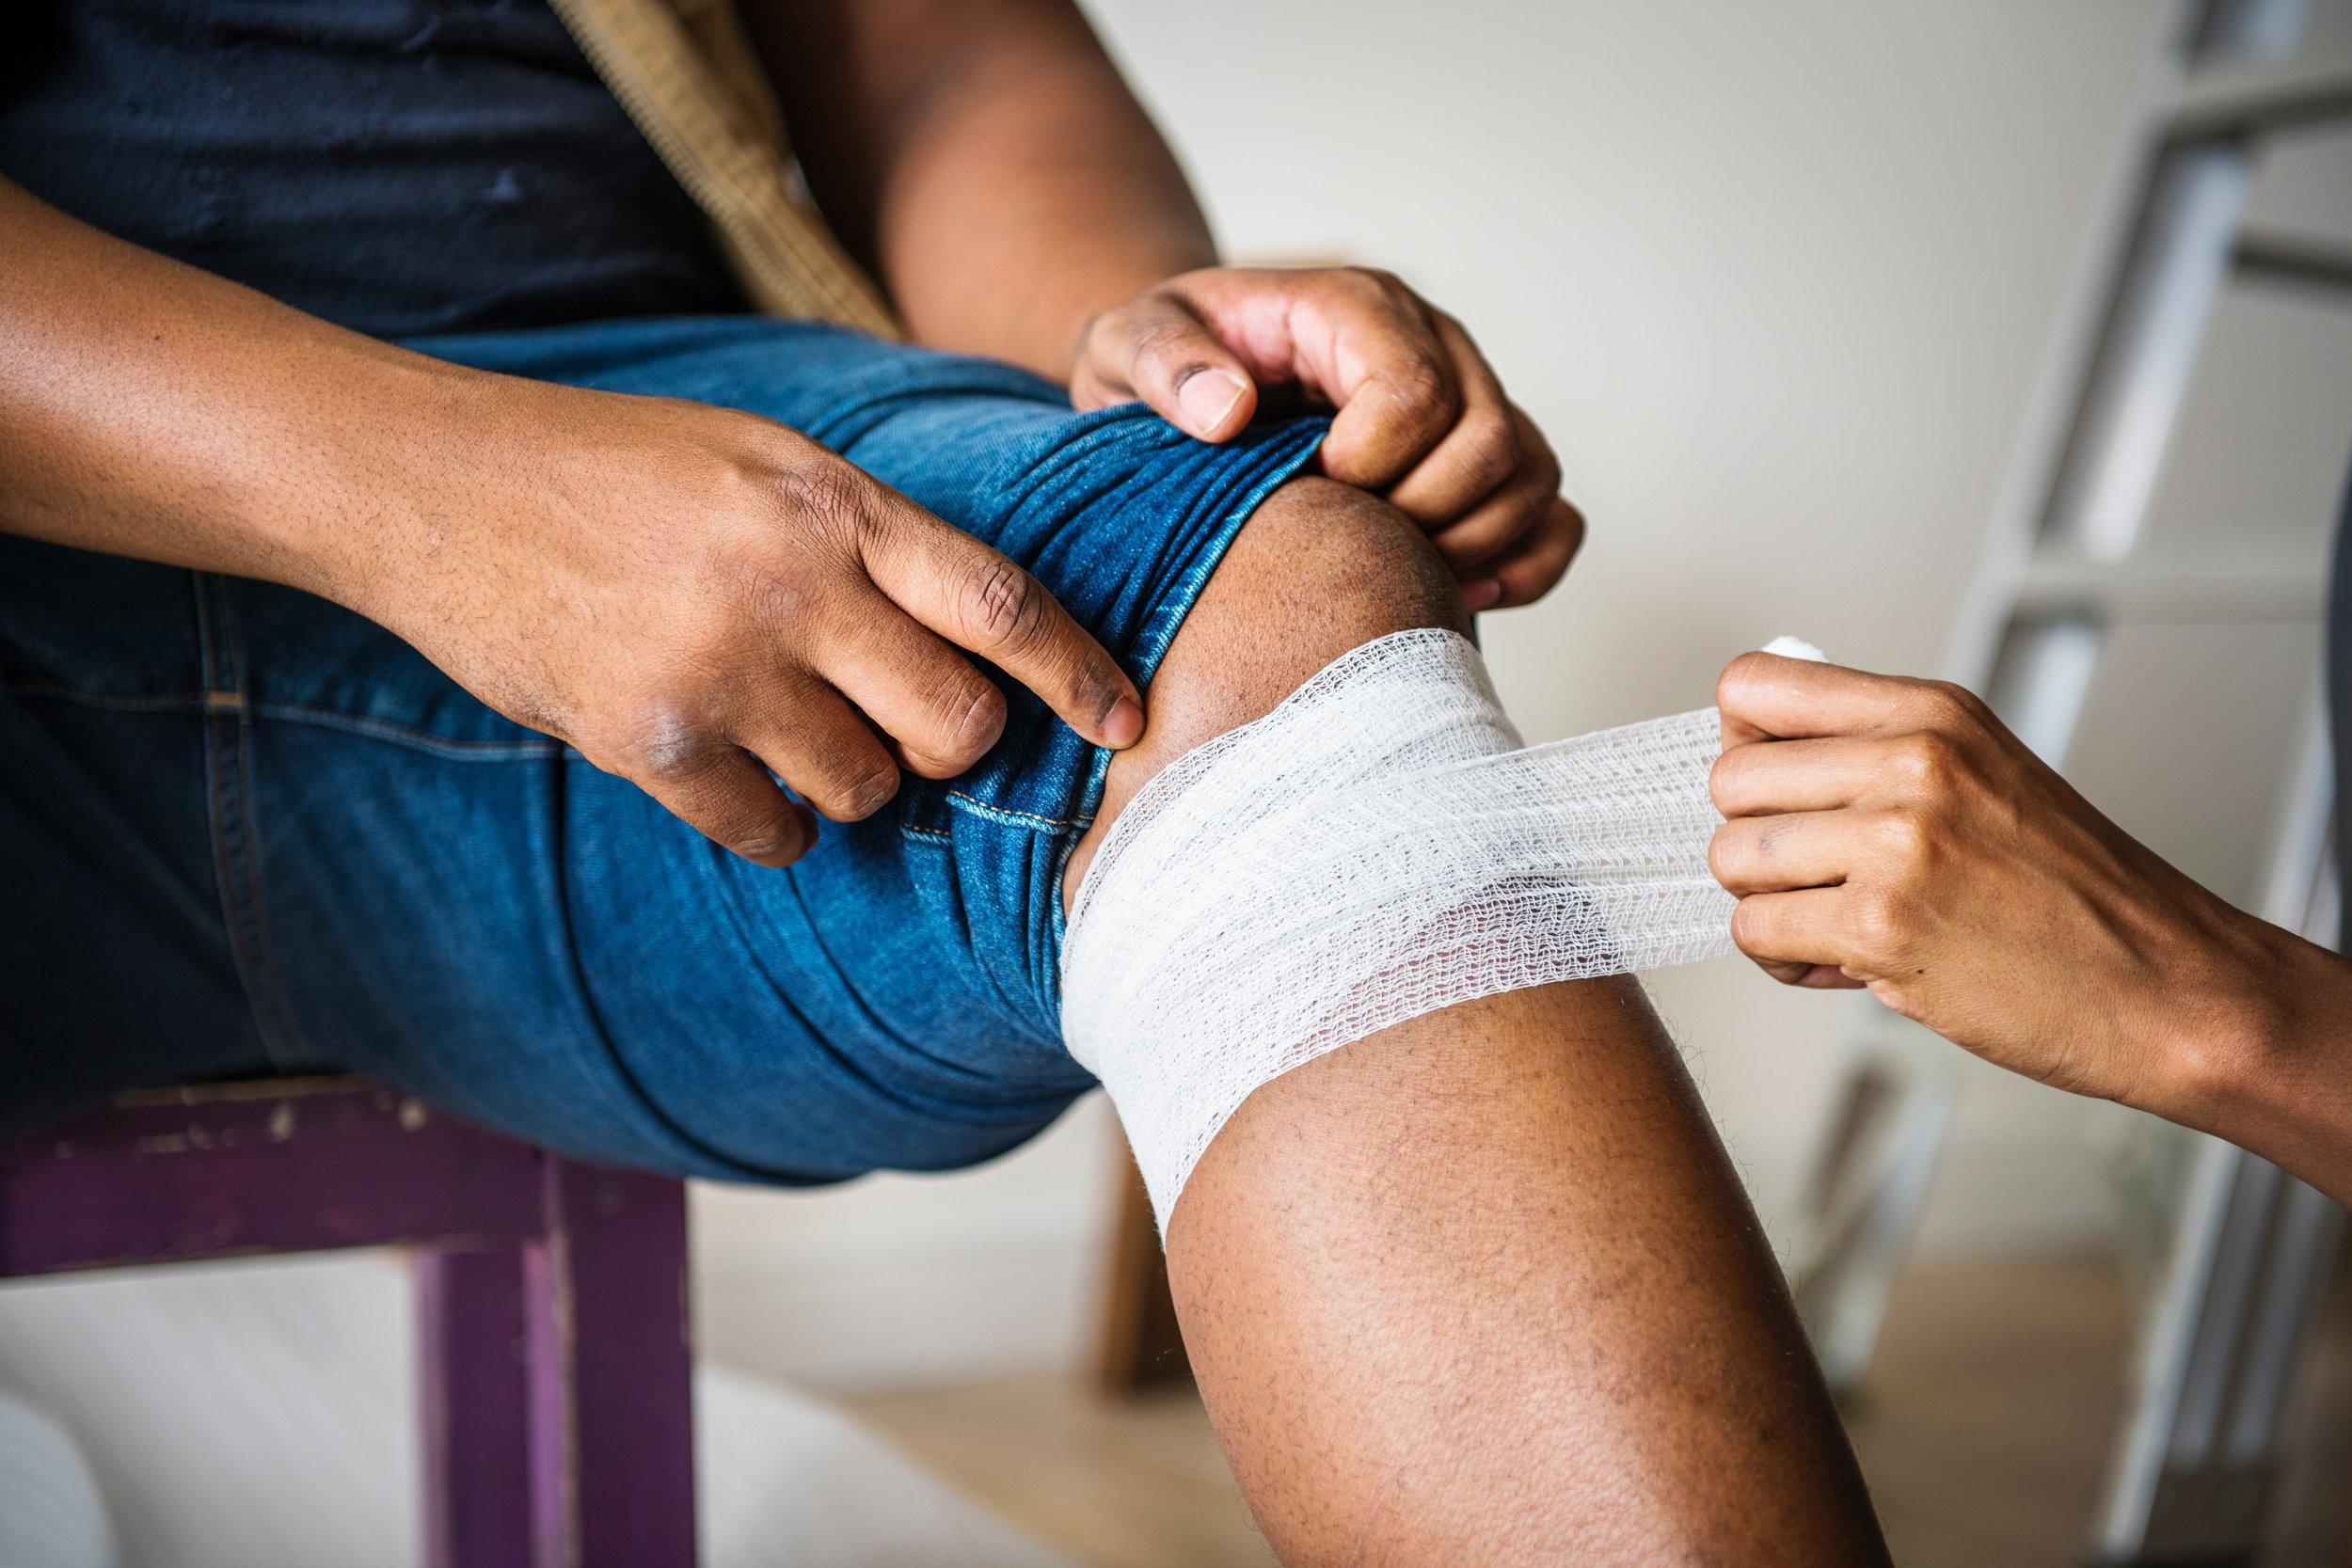 travel-wifi-yogofi-insurance-tips-injury-coverage